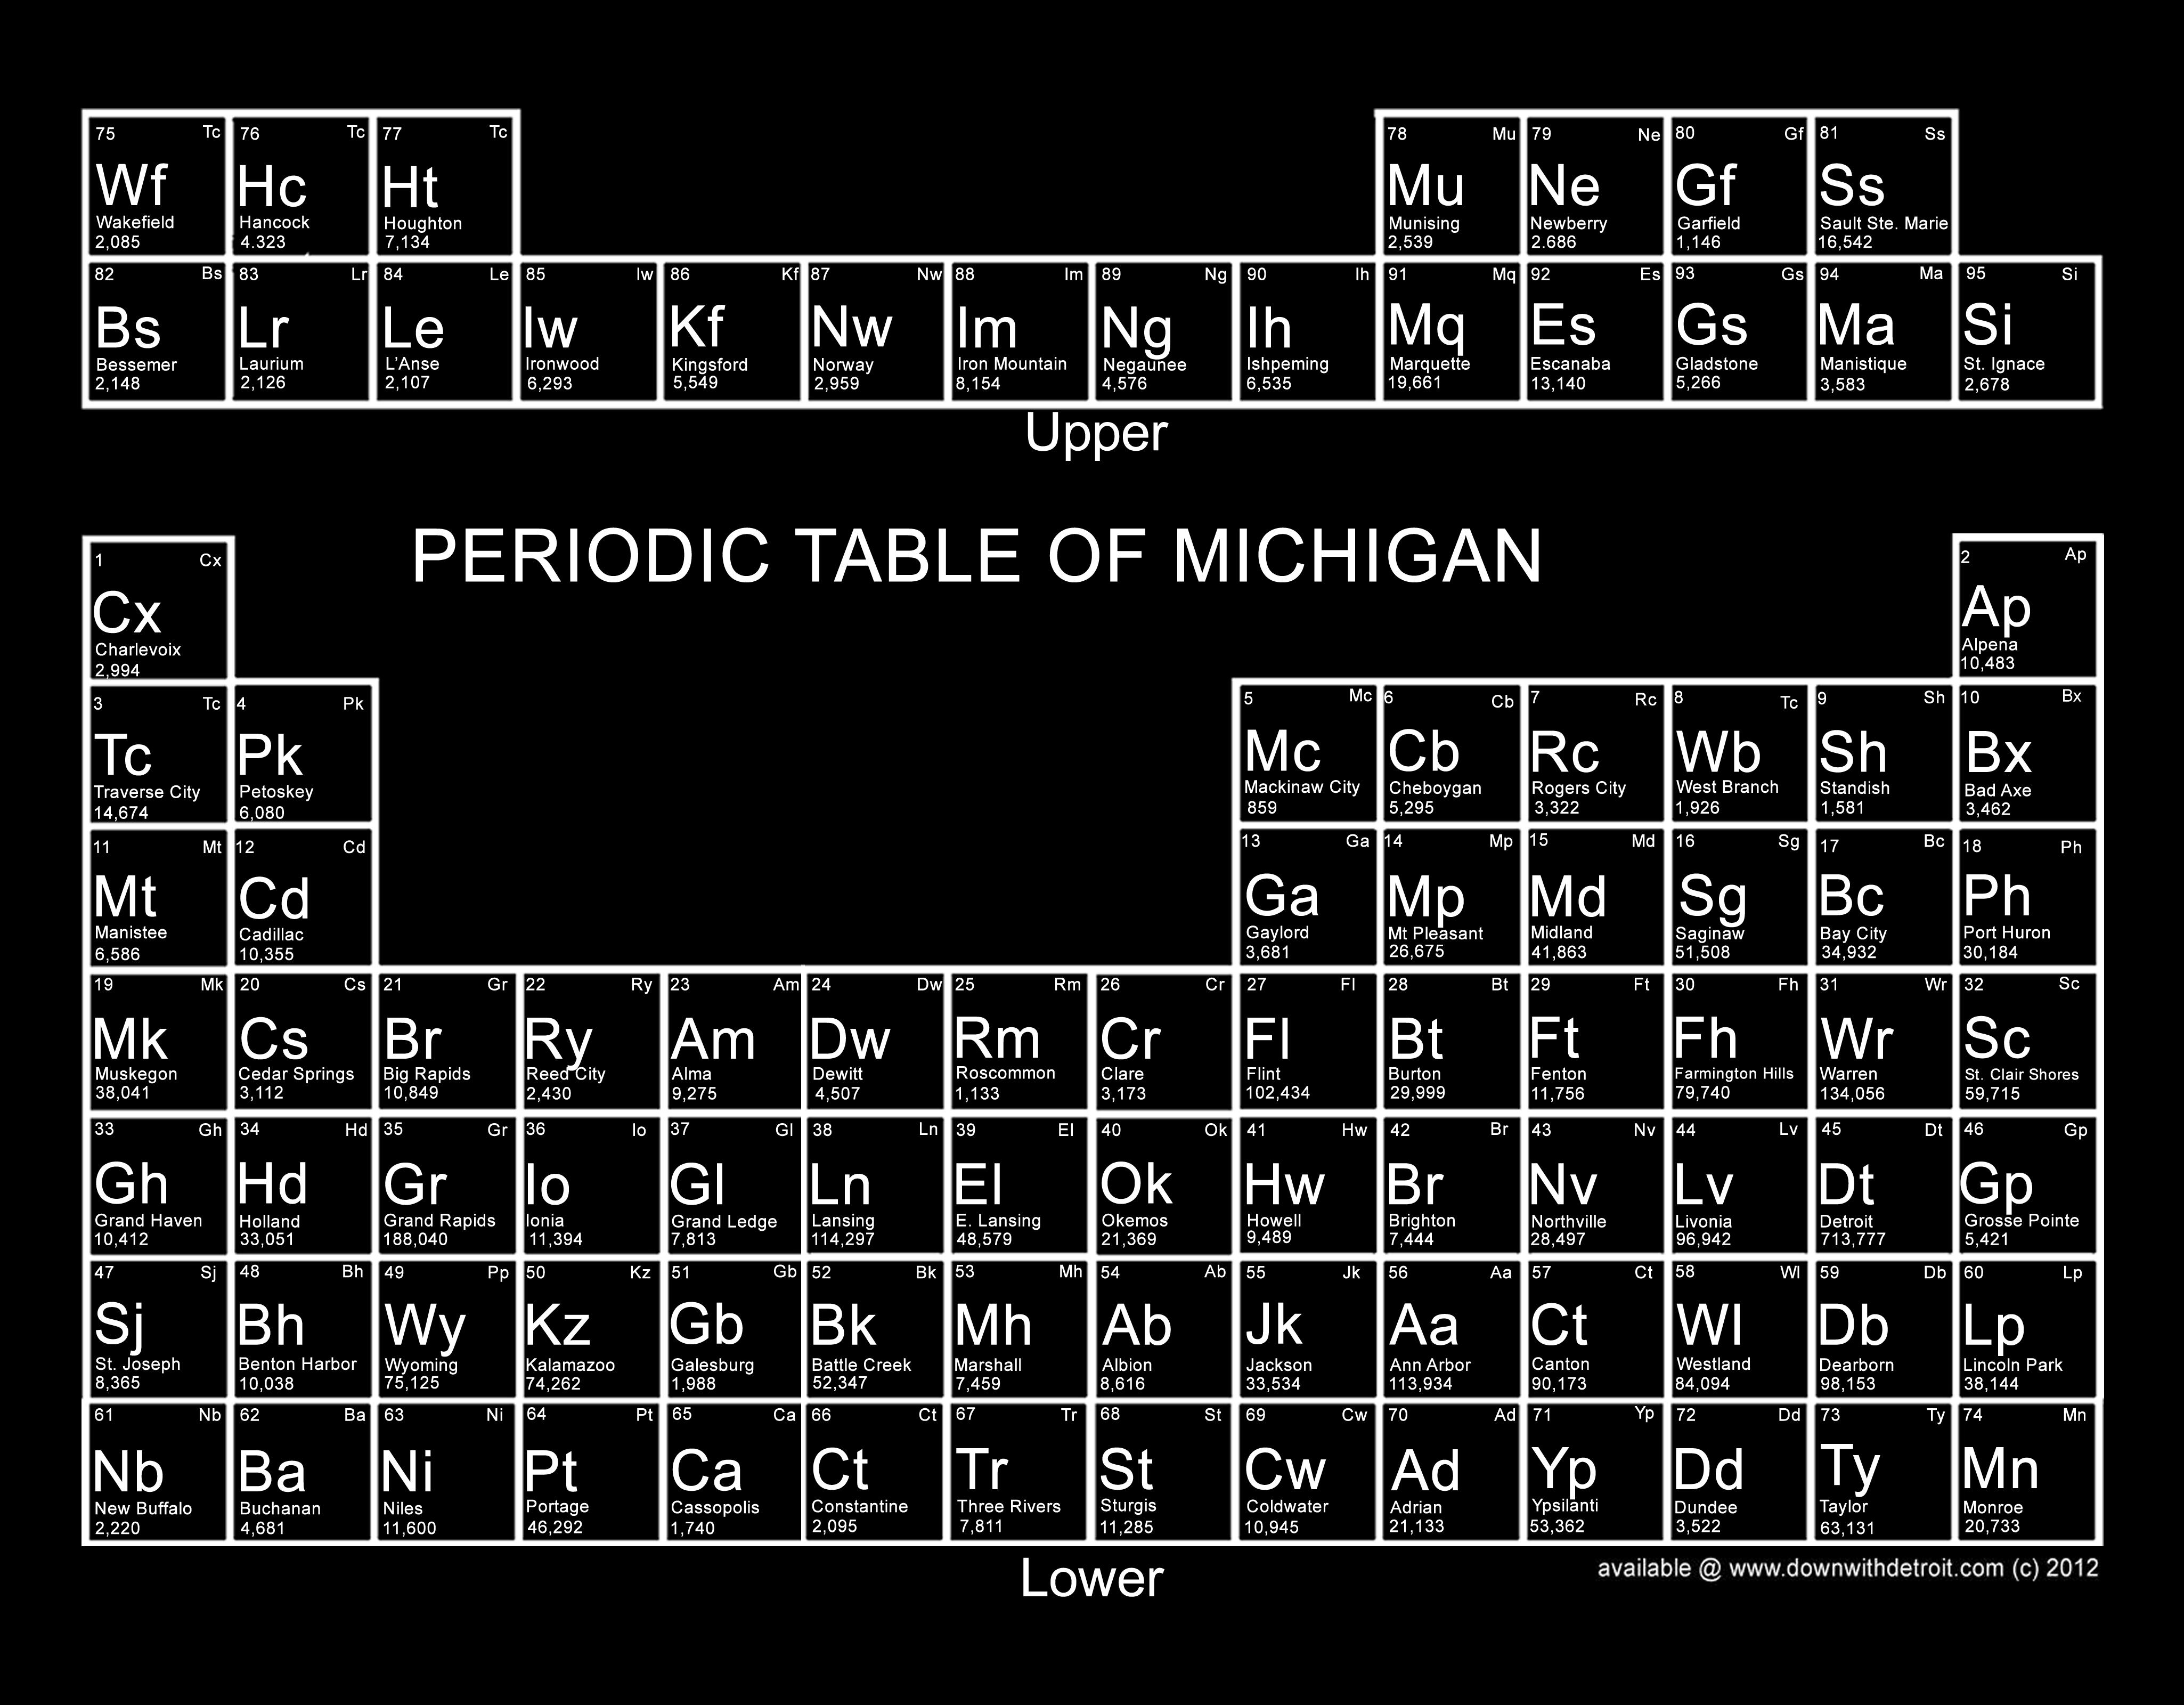 Periodic table of michigan shirt downwithdetroit periodic table of michigan shirt downwithdetroit gamestrikefo Choice Image